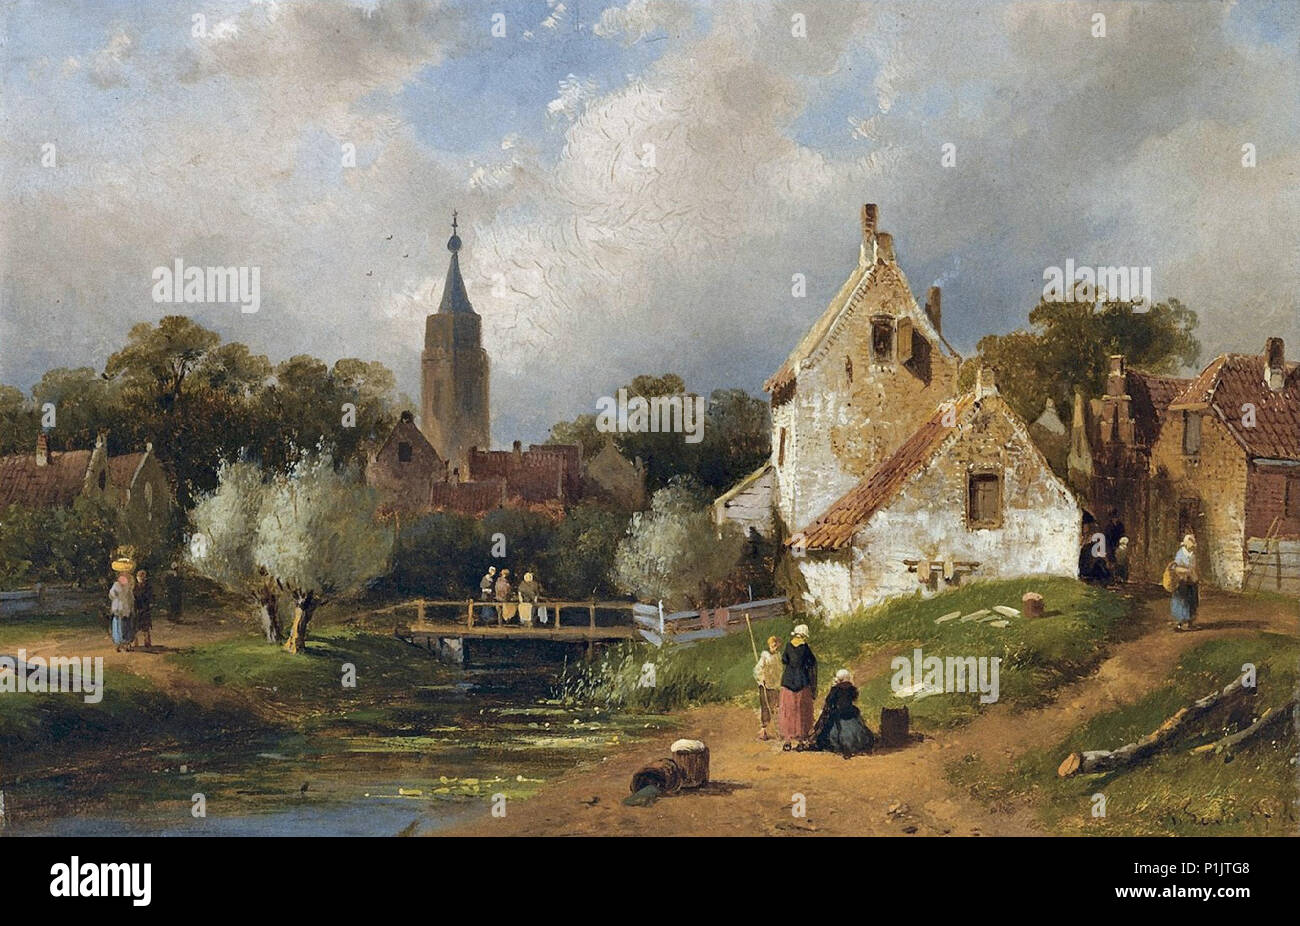 Leickert  Charles Henri Joseph - View of a Riverside Village in Summer Stock Photo